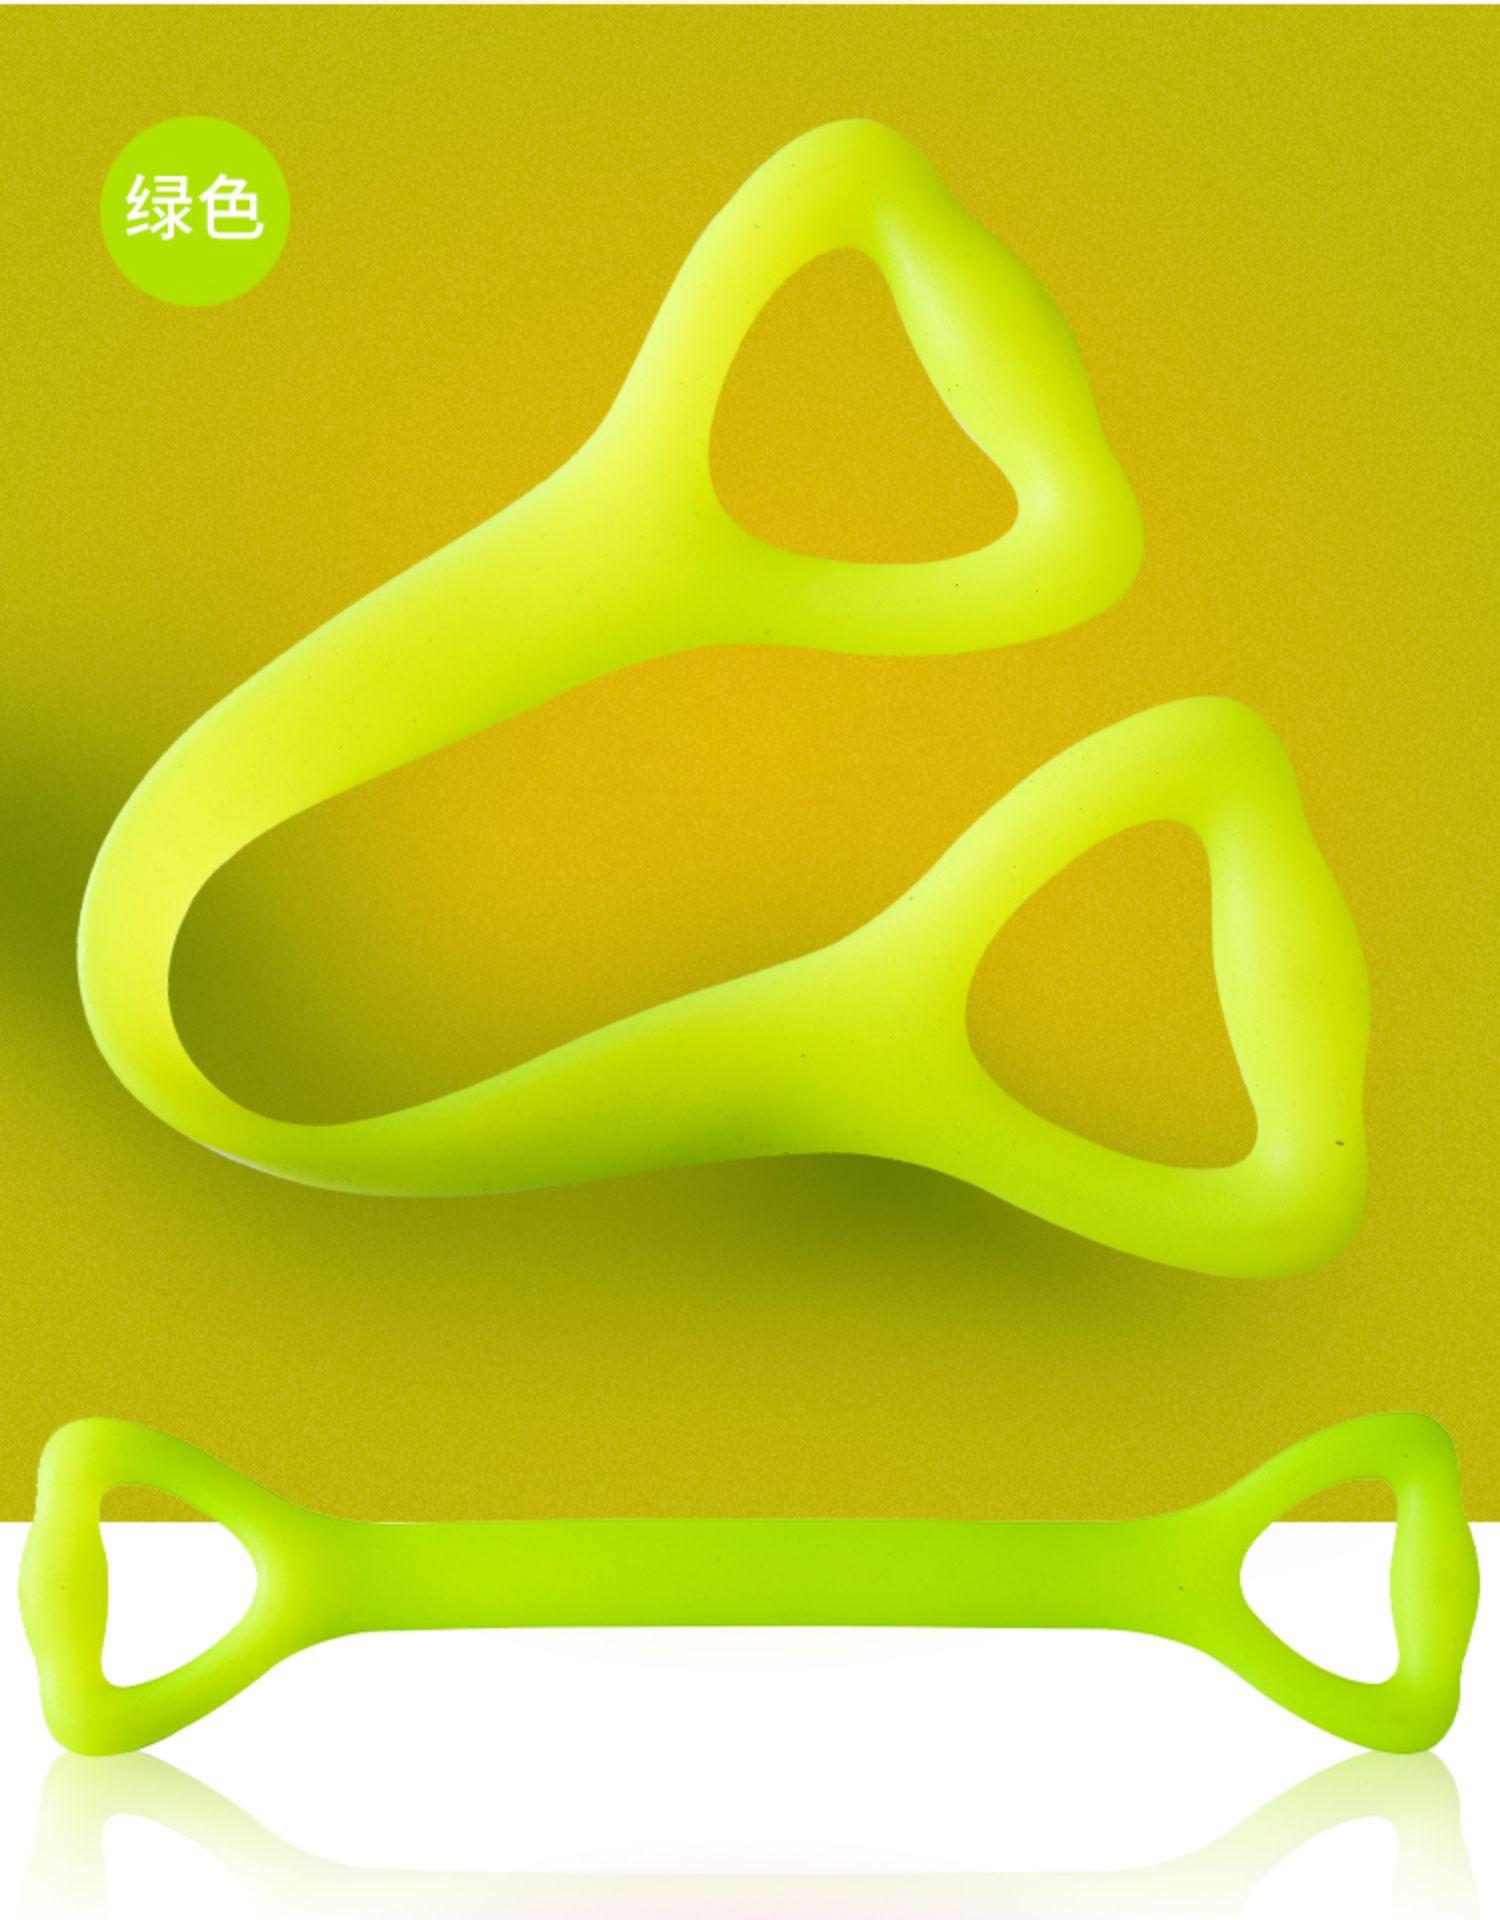 portátil yoga muscular treinamento abdominal borracha exercitador de musculação ef50ld